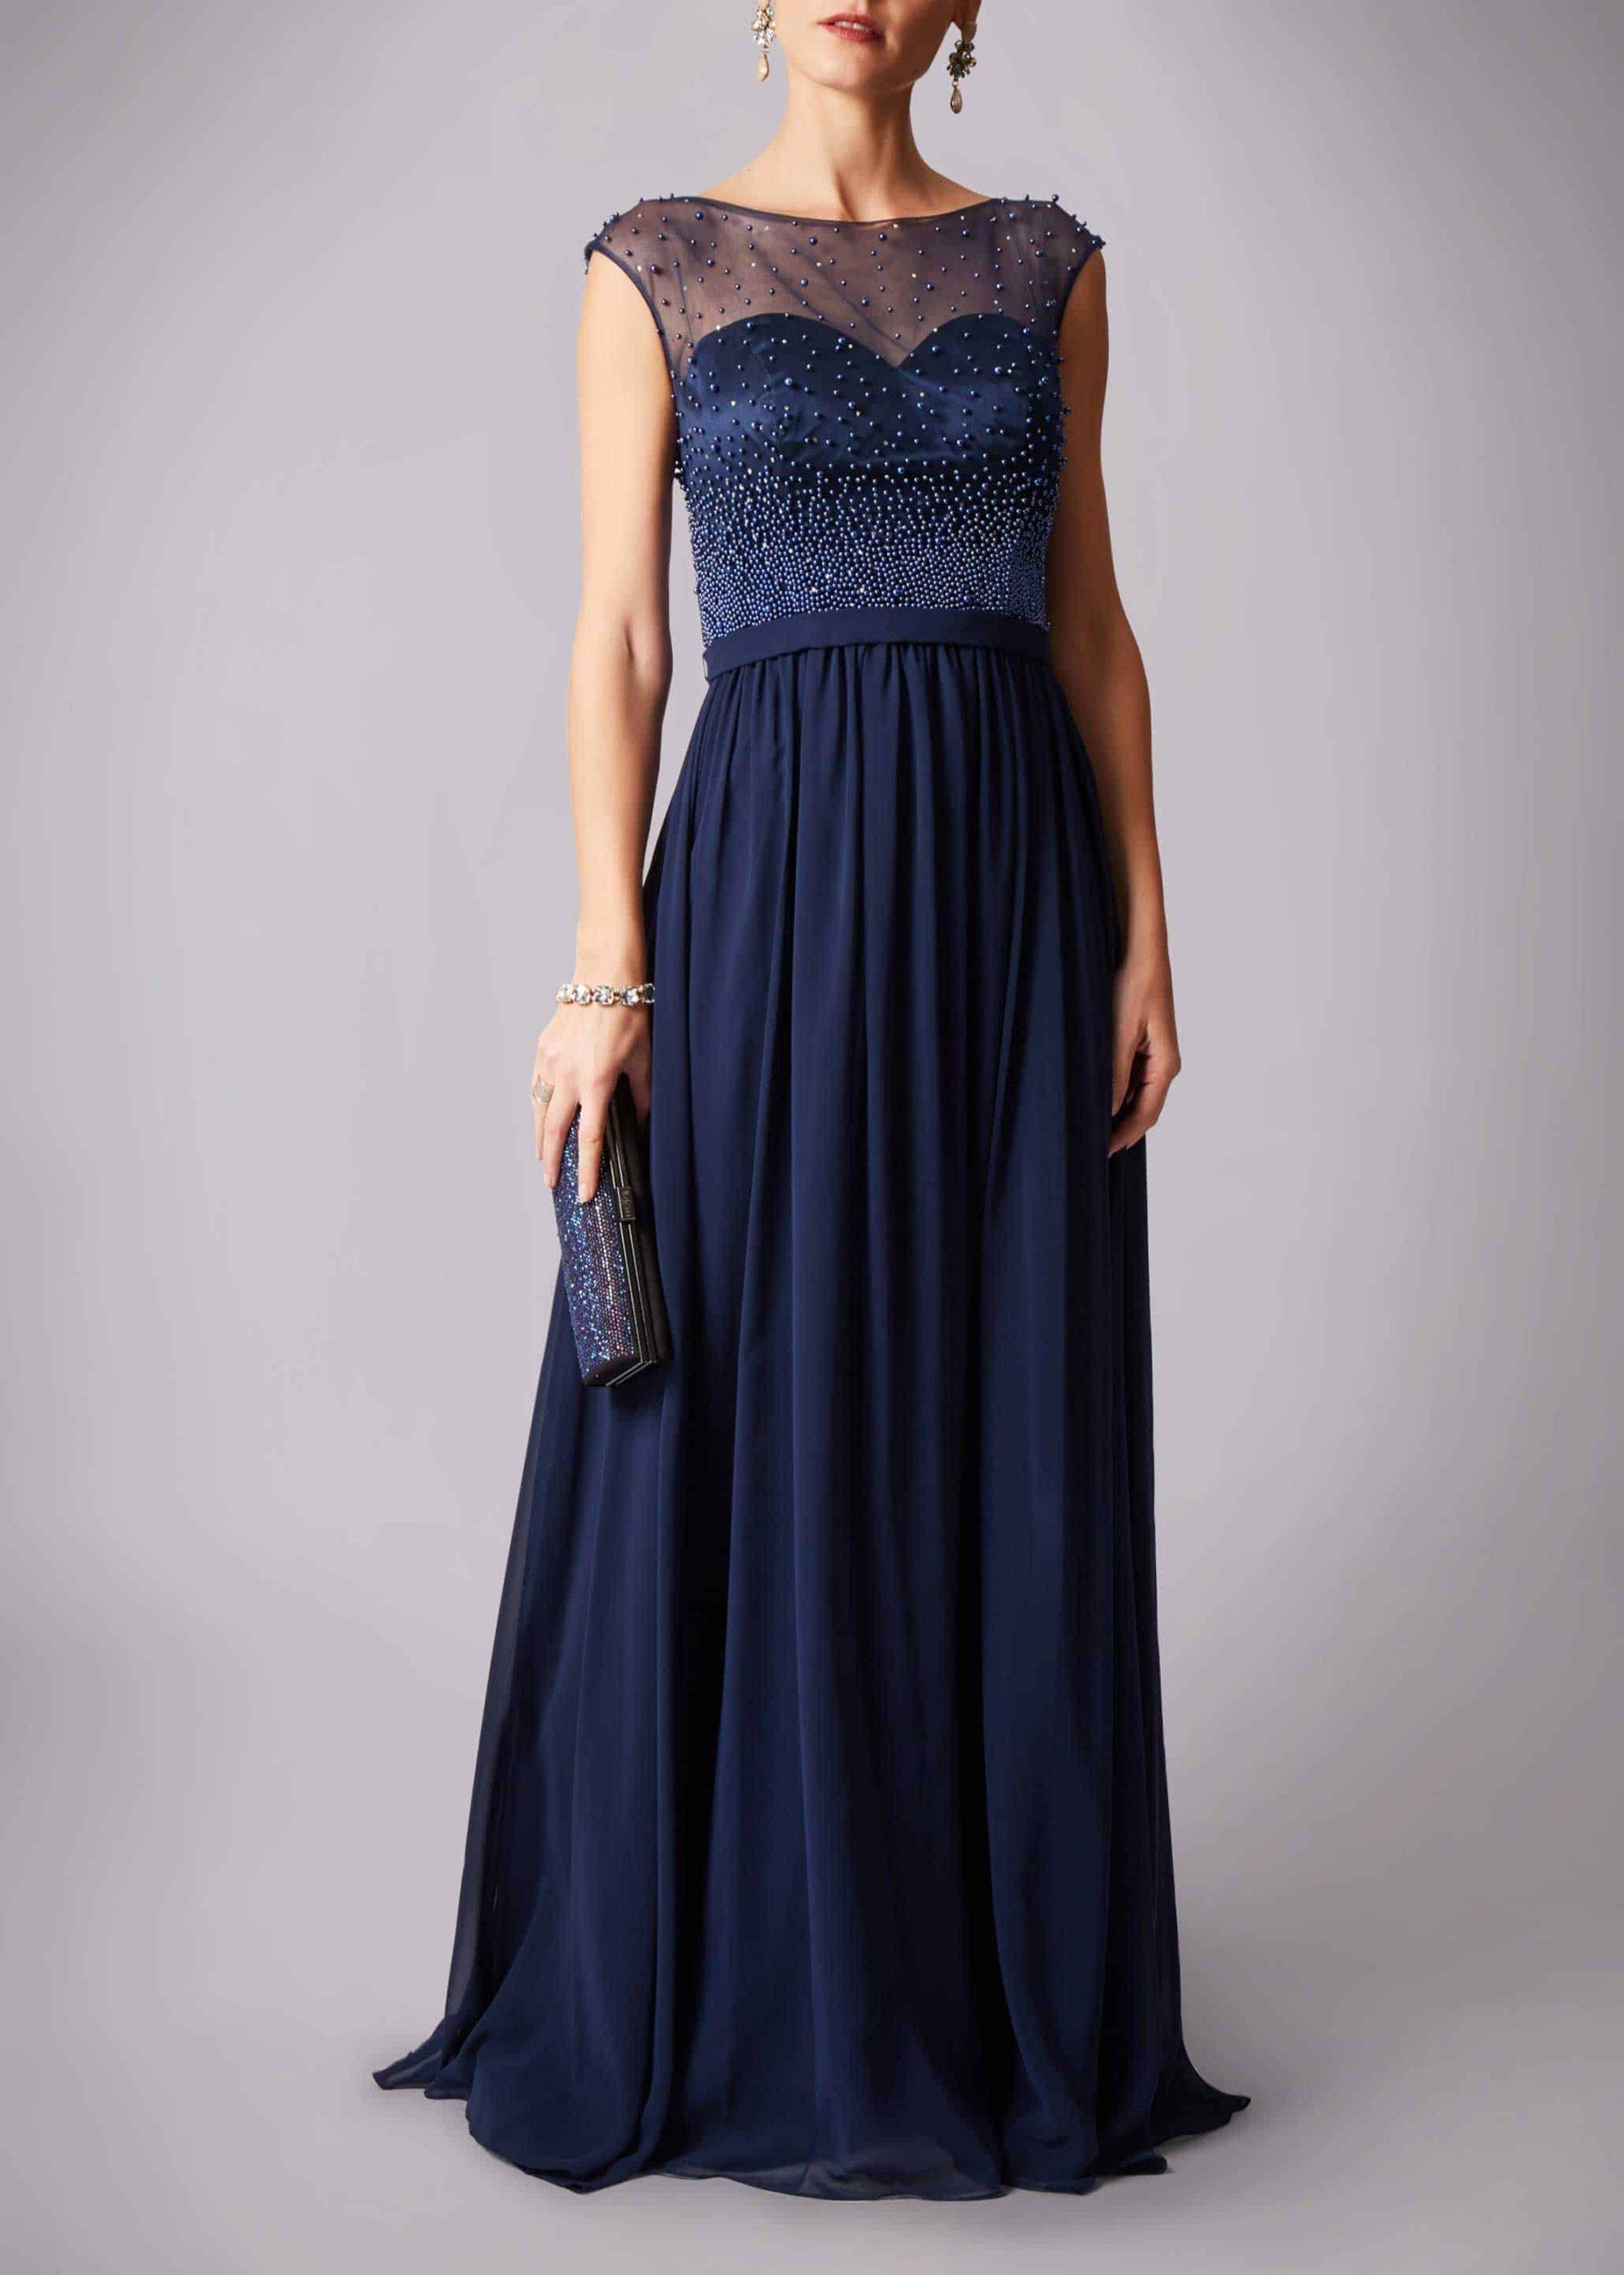 12 Großartig About You Mascara Abendkleid Spezialgebiet - Abendkleid